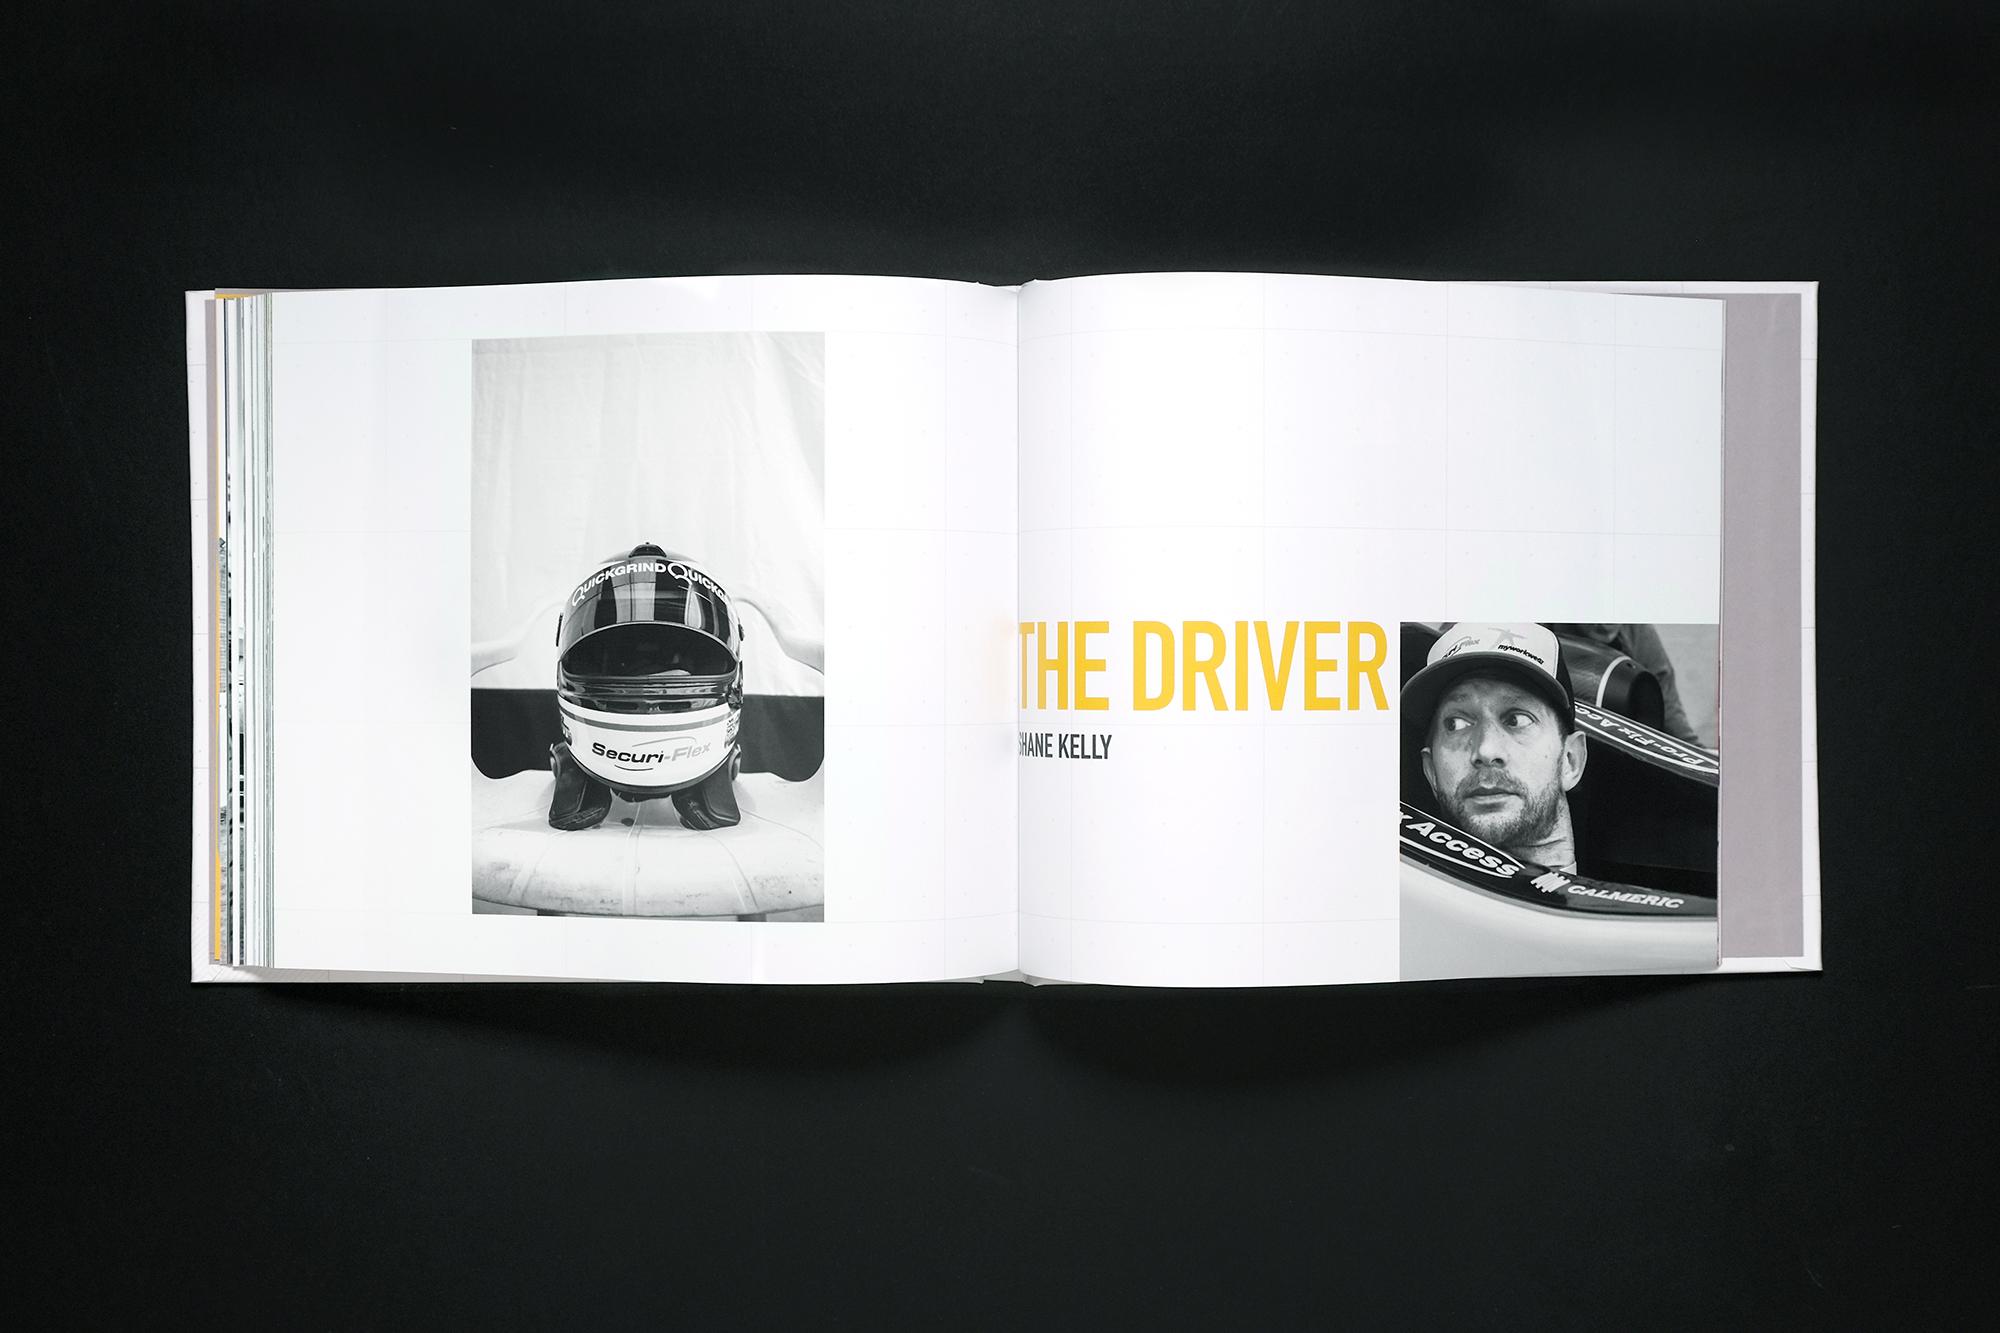 http://rusyndesign.co.uk/wp-content/uploads/2020/04/UWR-19-book-shots-25.jpg